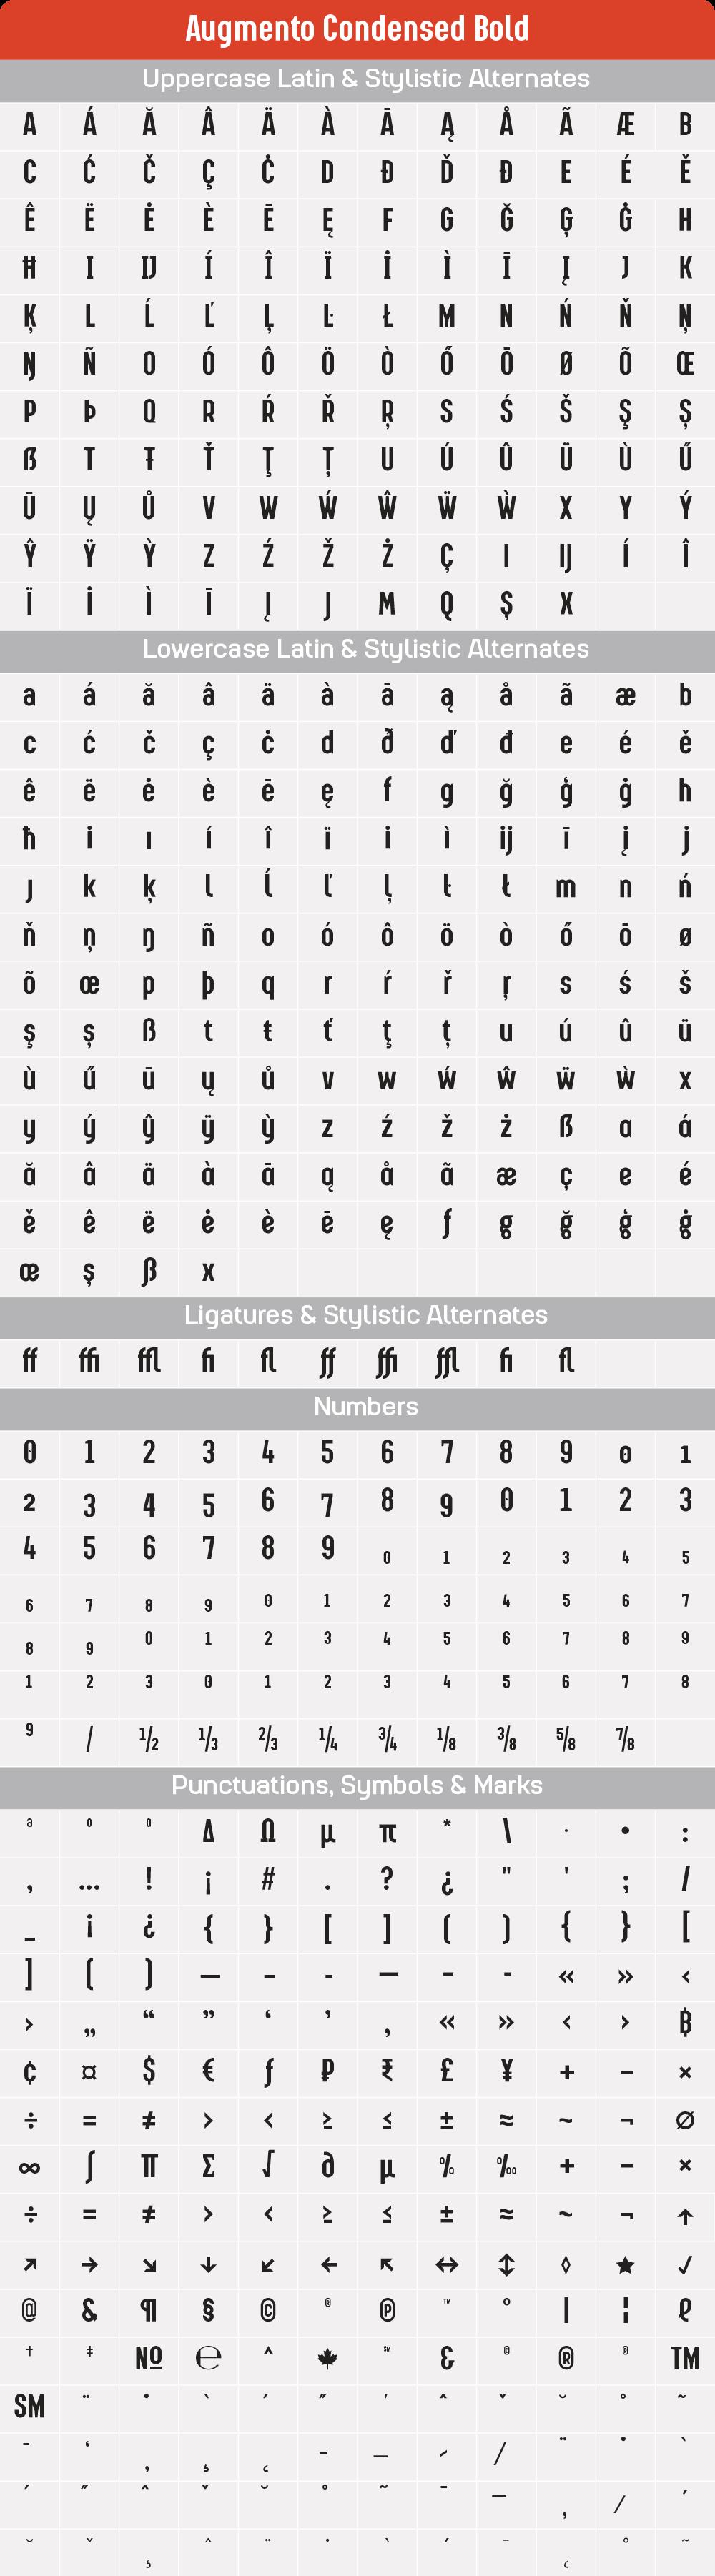 Condensed BoldAugmento-GlyphTable.png